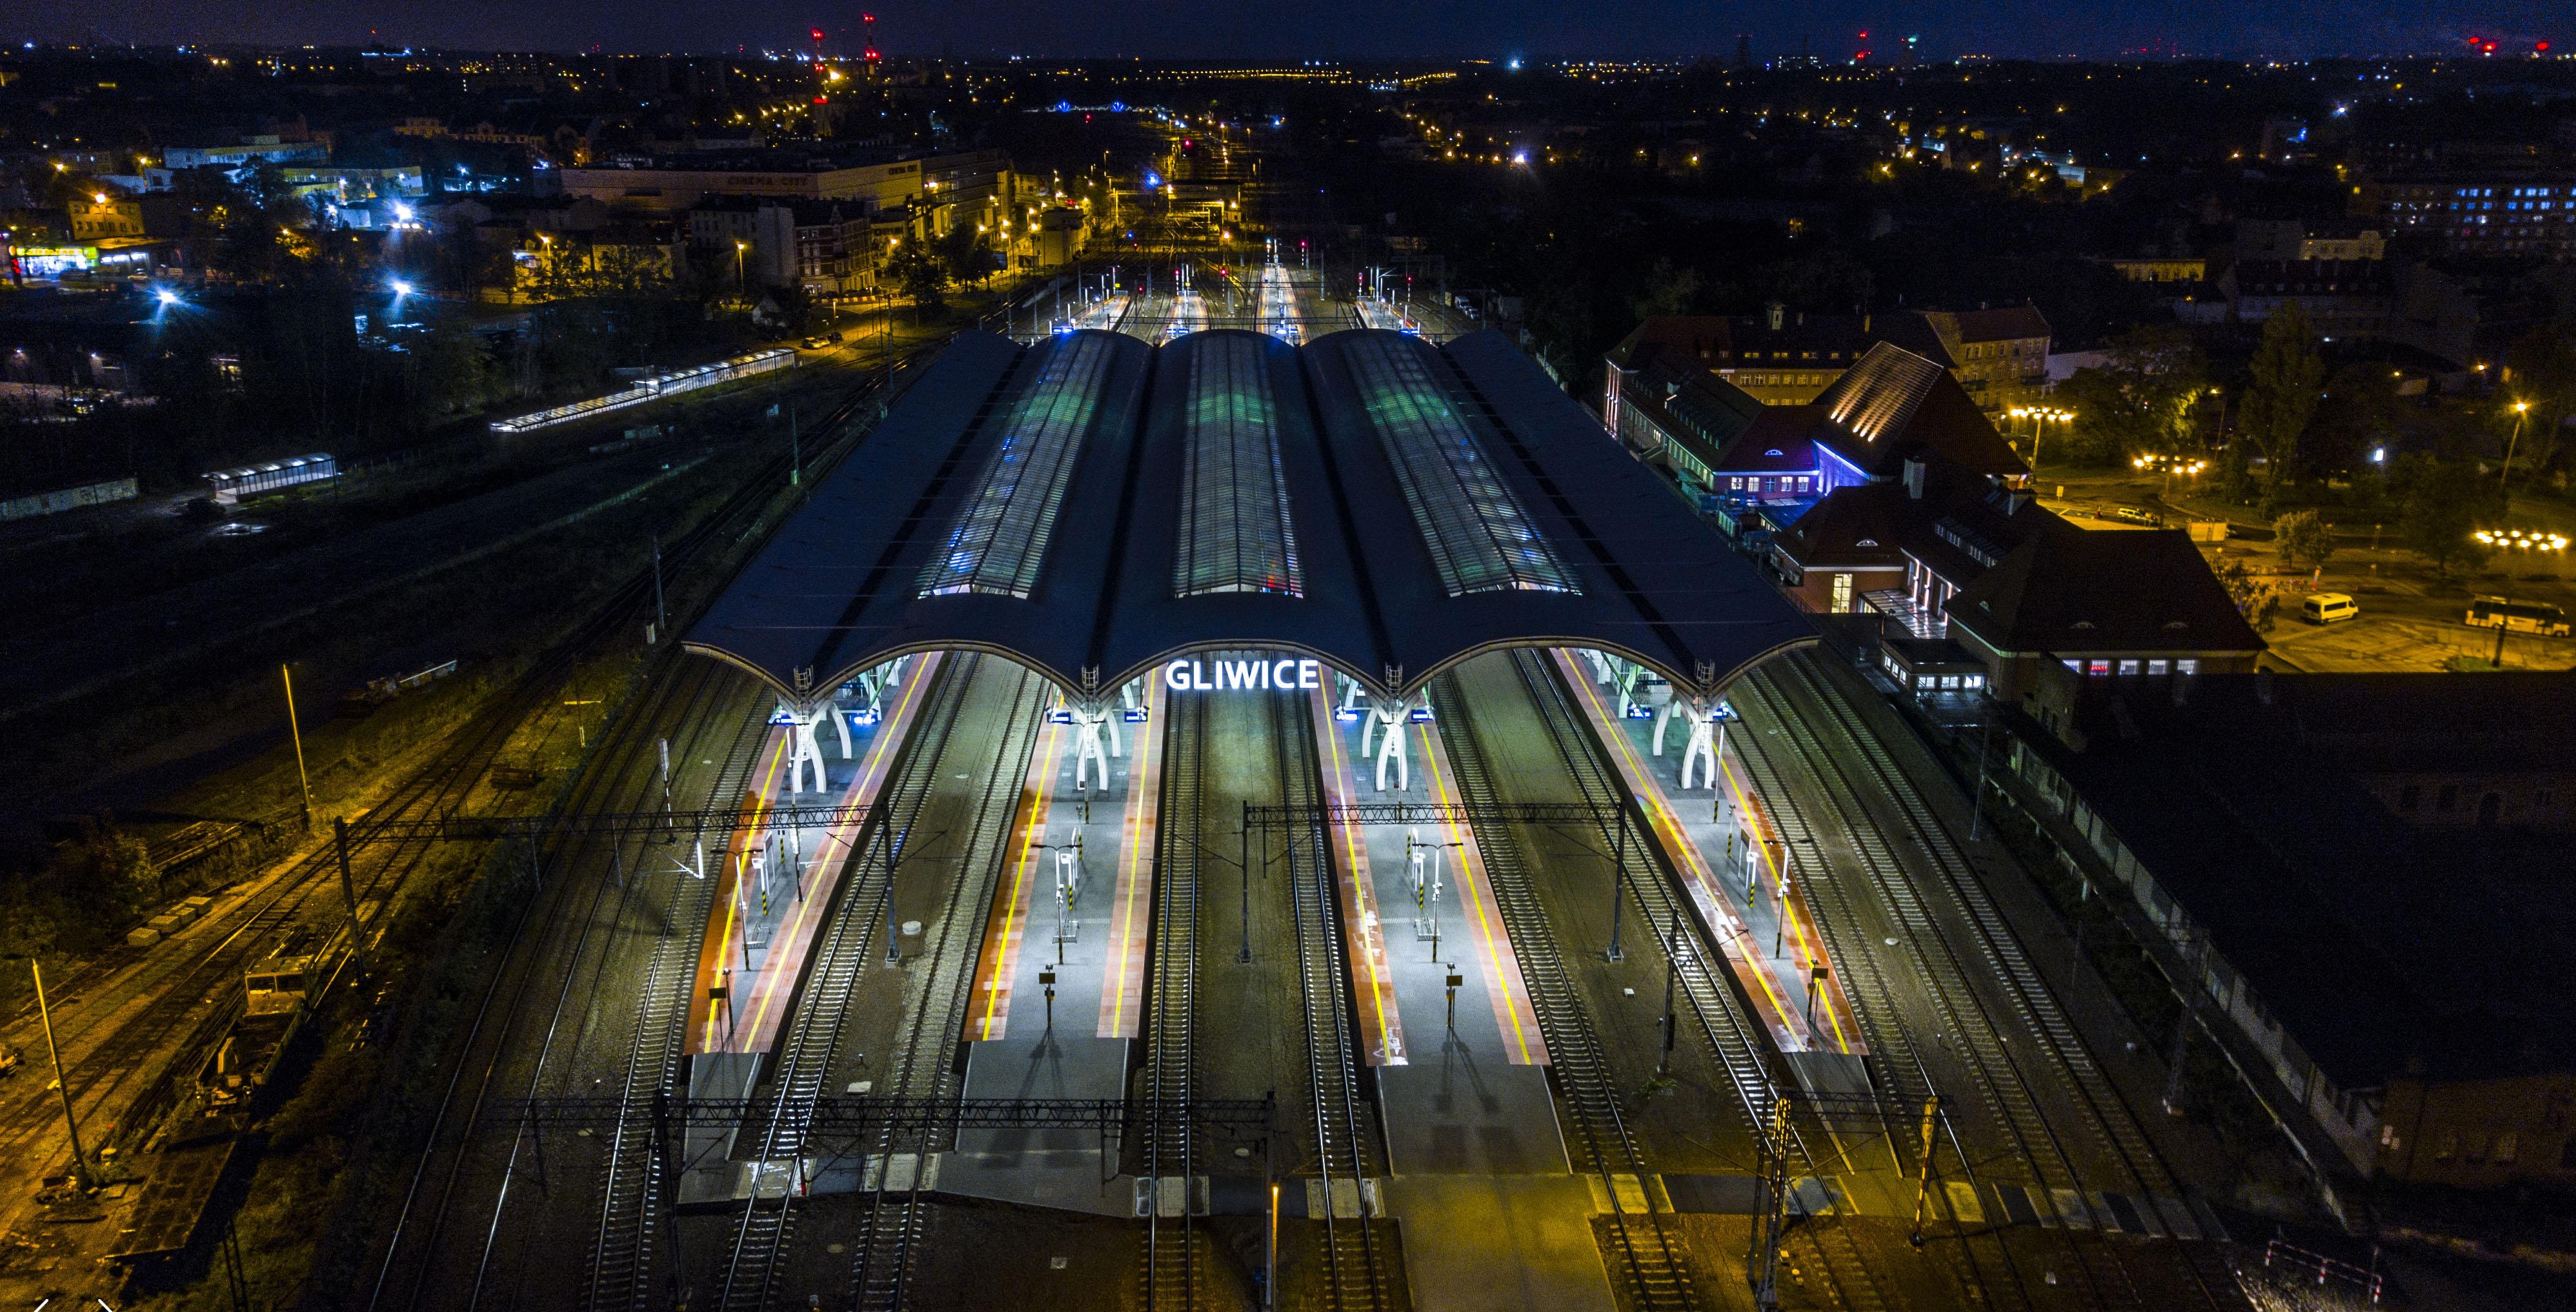 stacja Gliwice